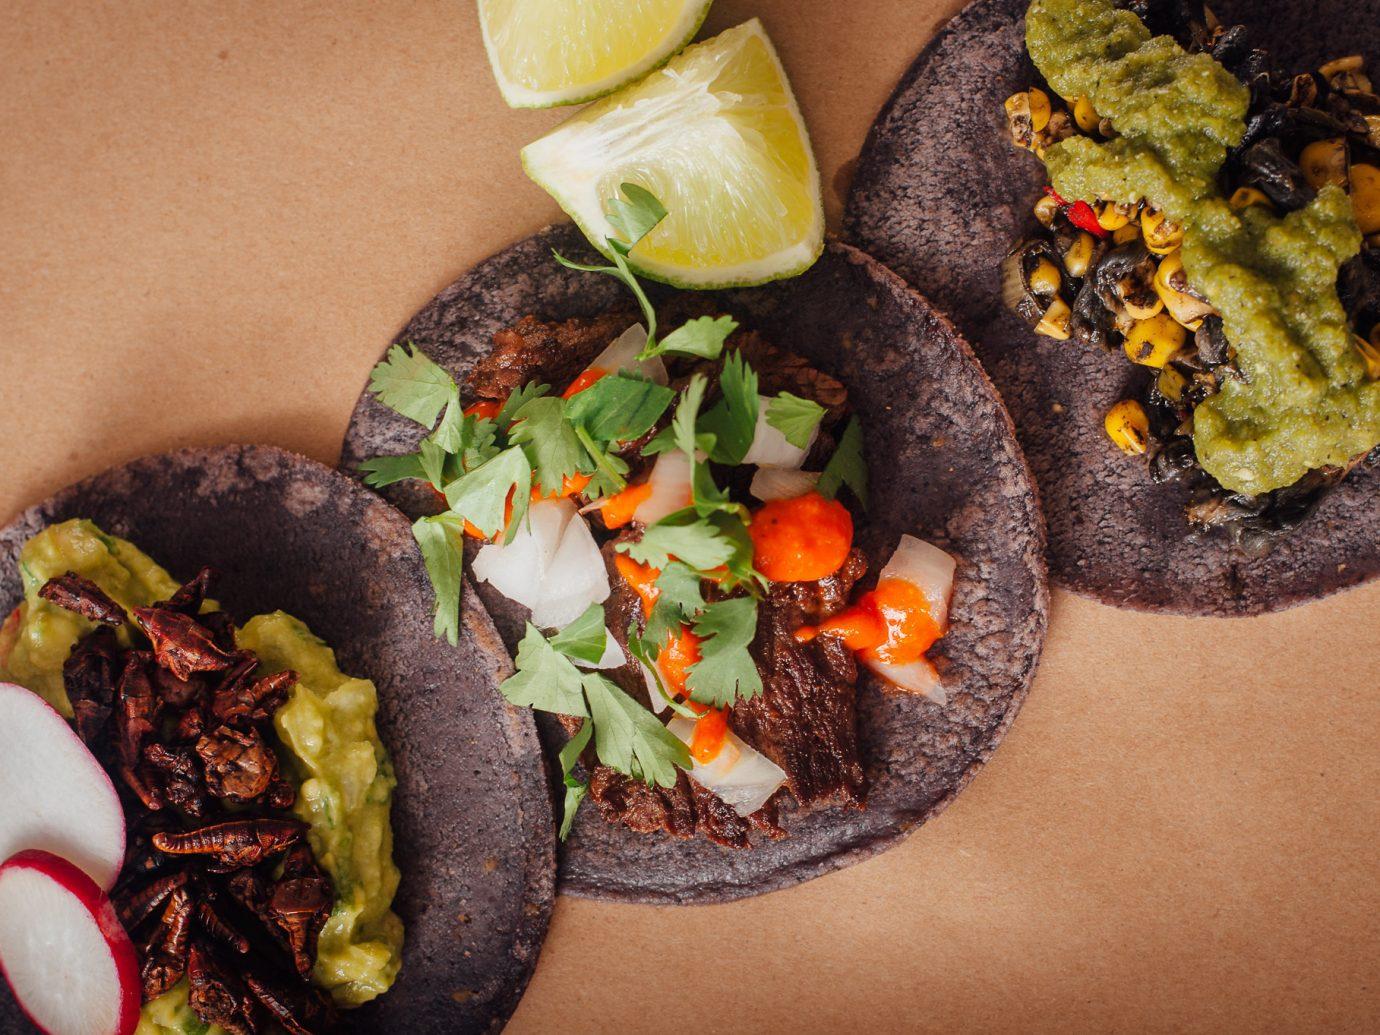 Travel Tips food dish cuisine meal vegetarian food recipe vegetable finger food toppings meat